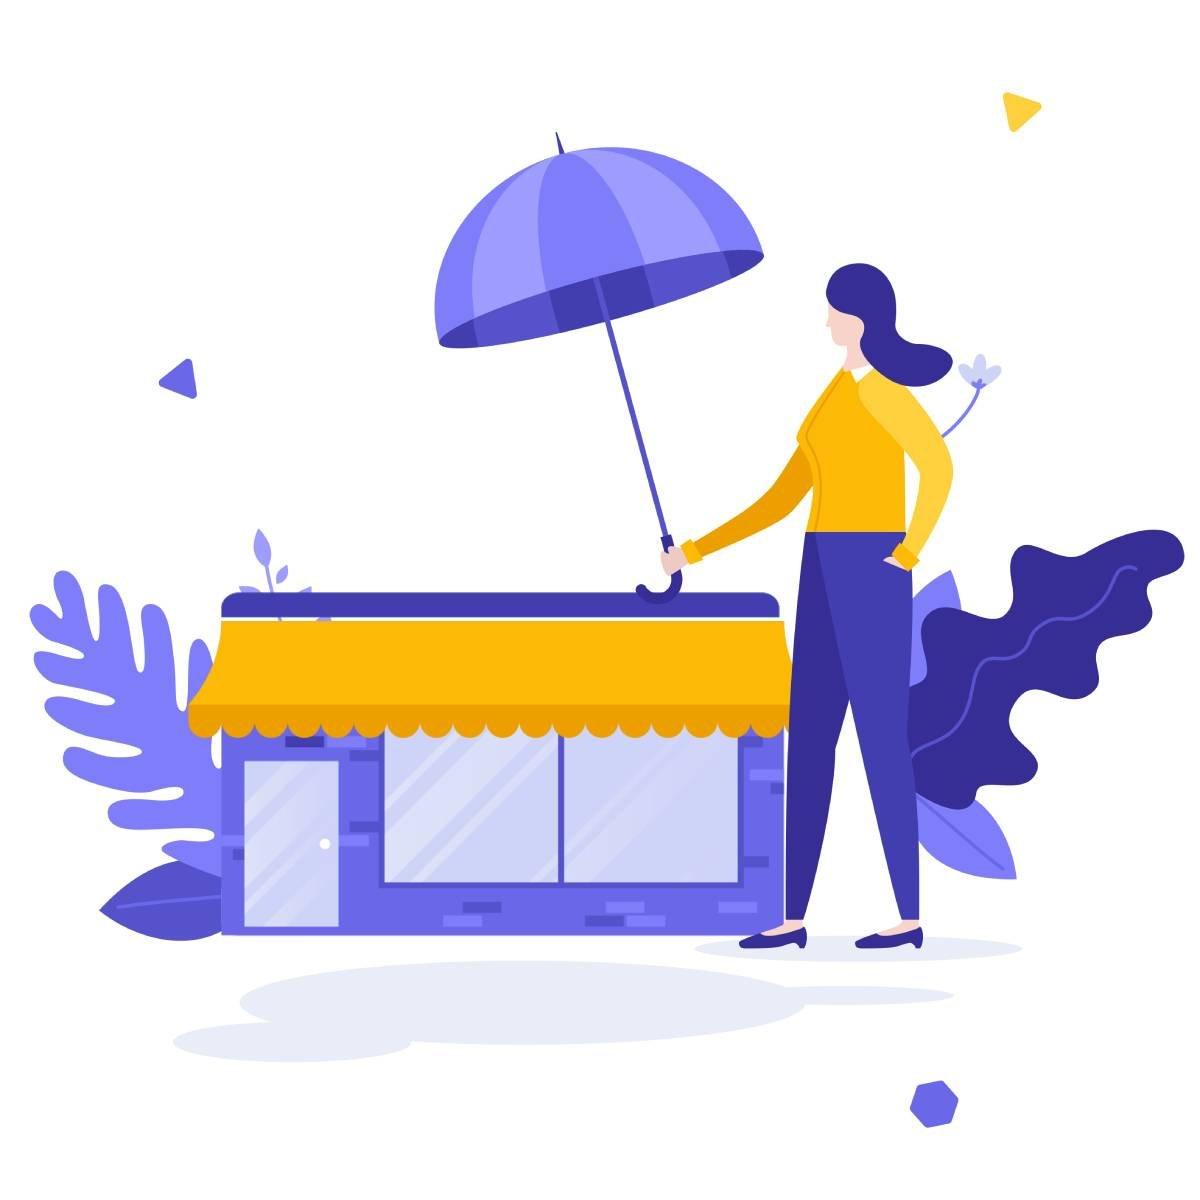 Woamn with umbrella over business